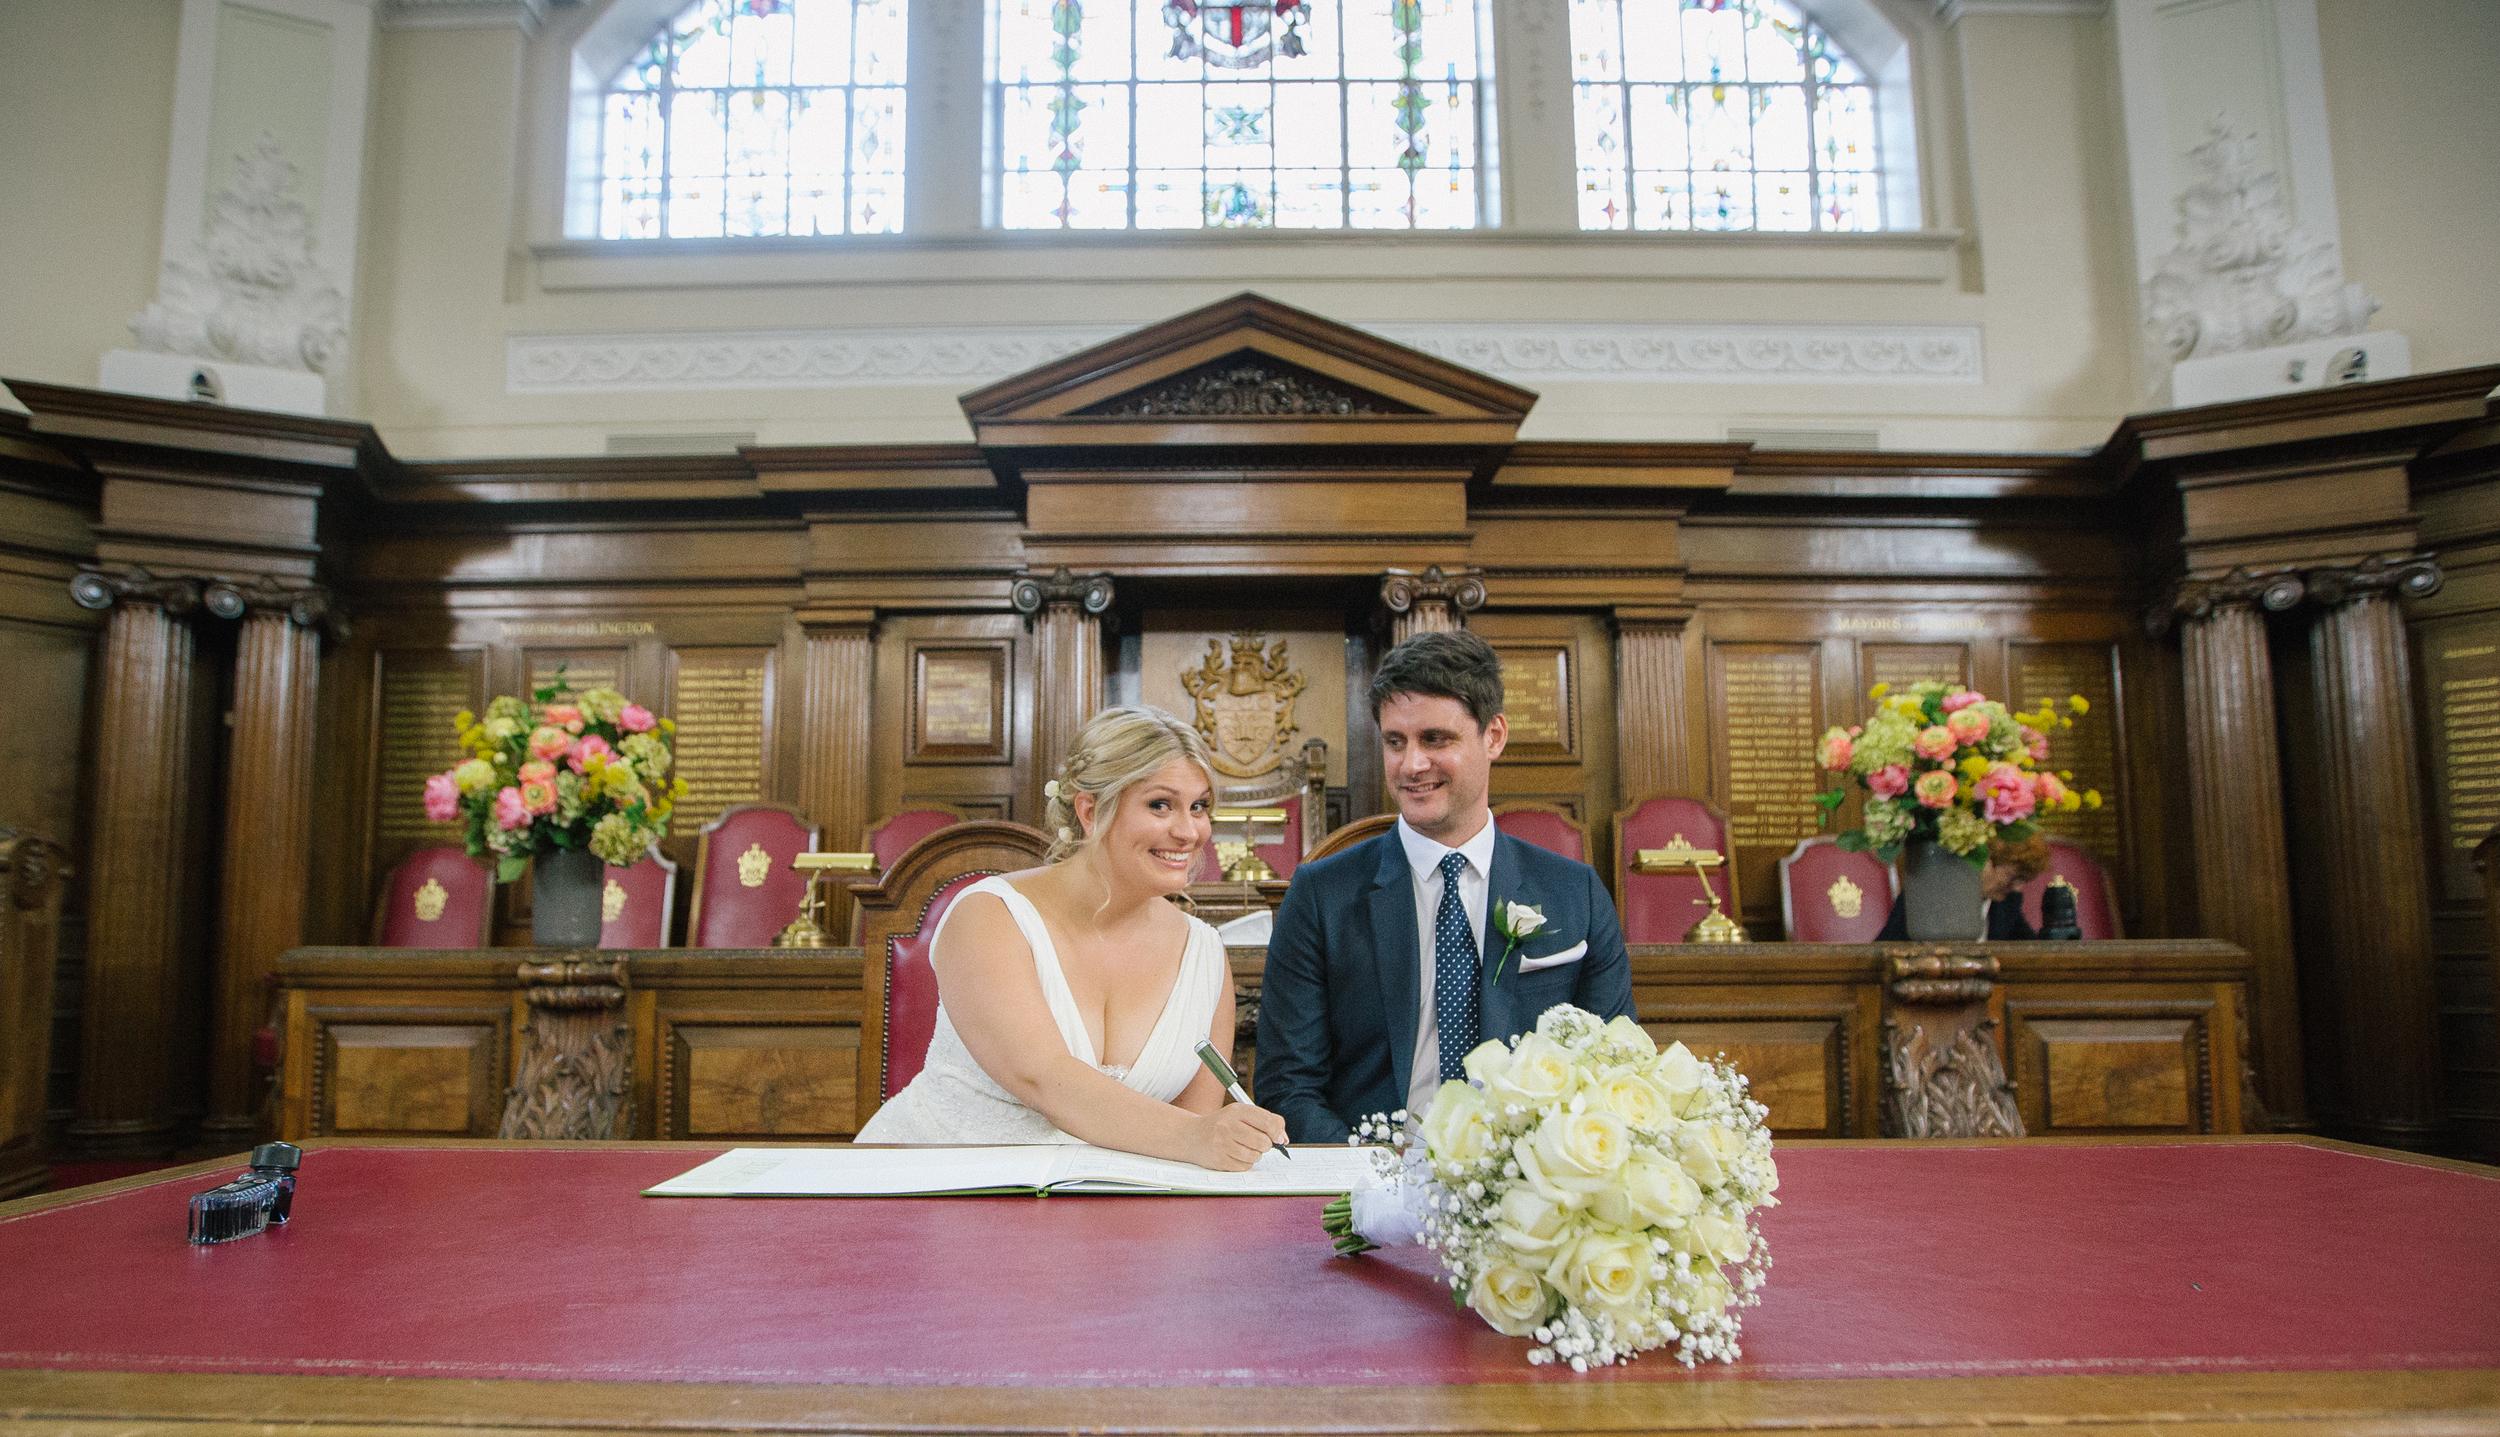 Islington-town-hall-signing-wedding-register-1